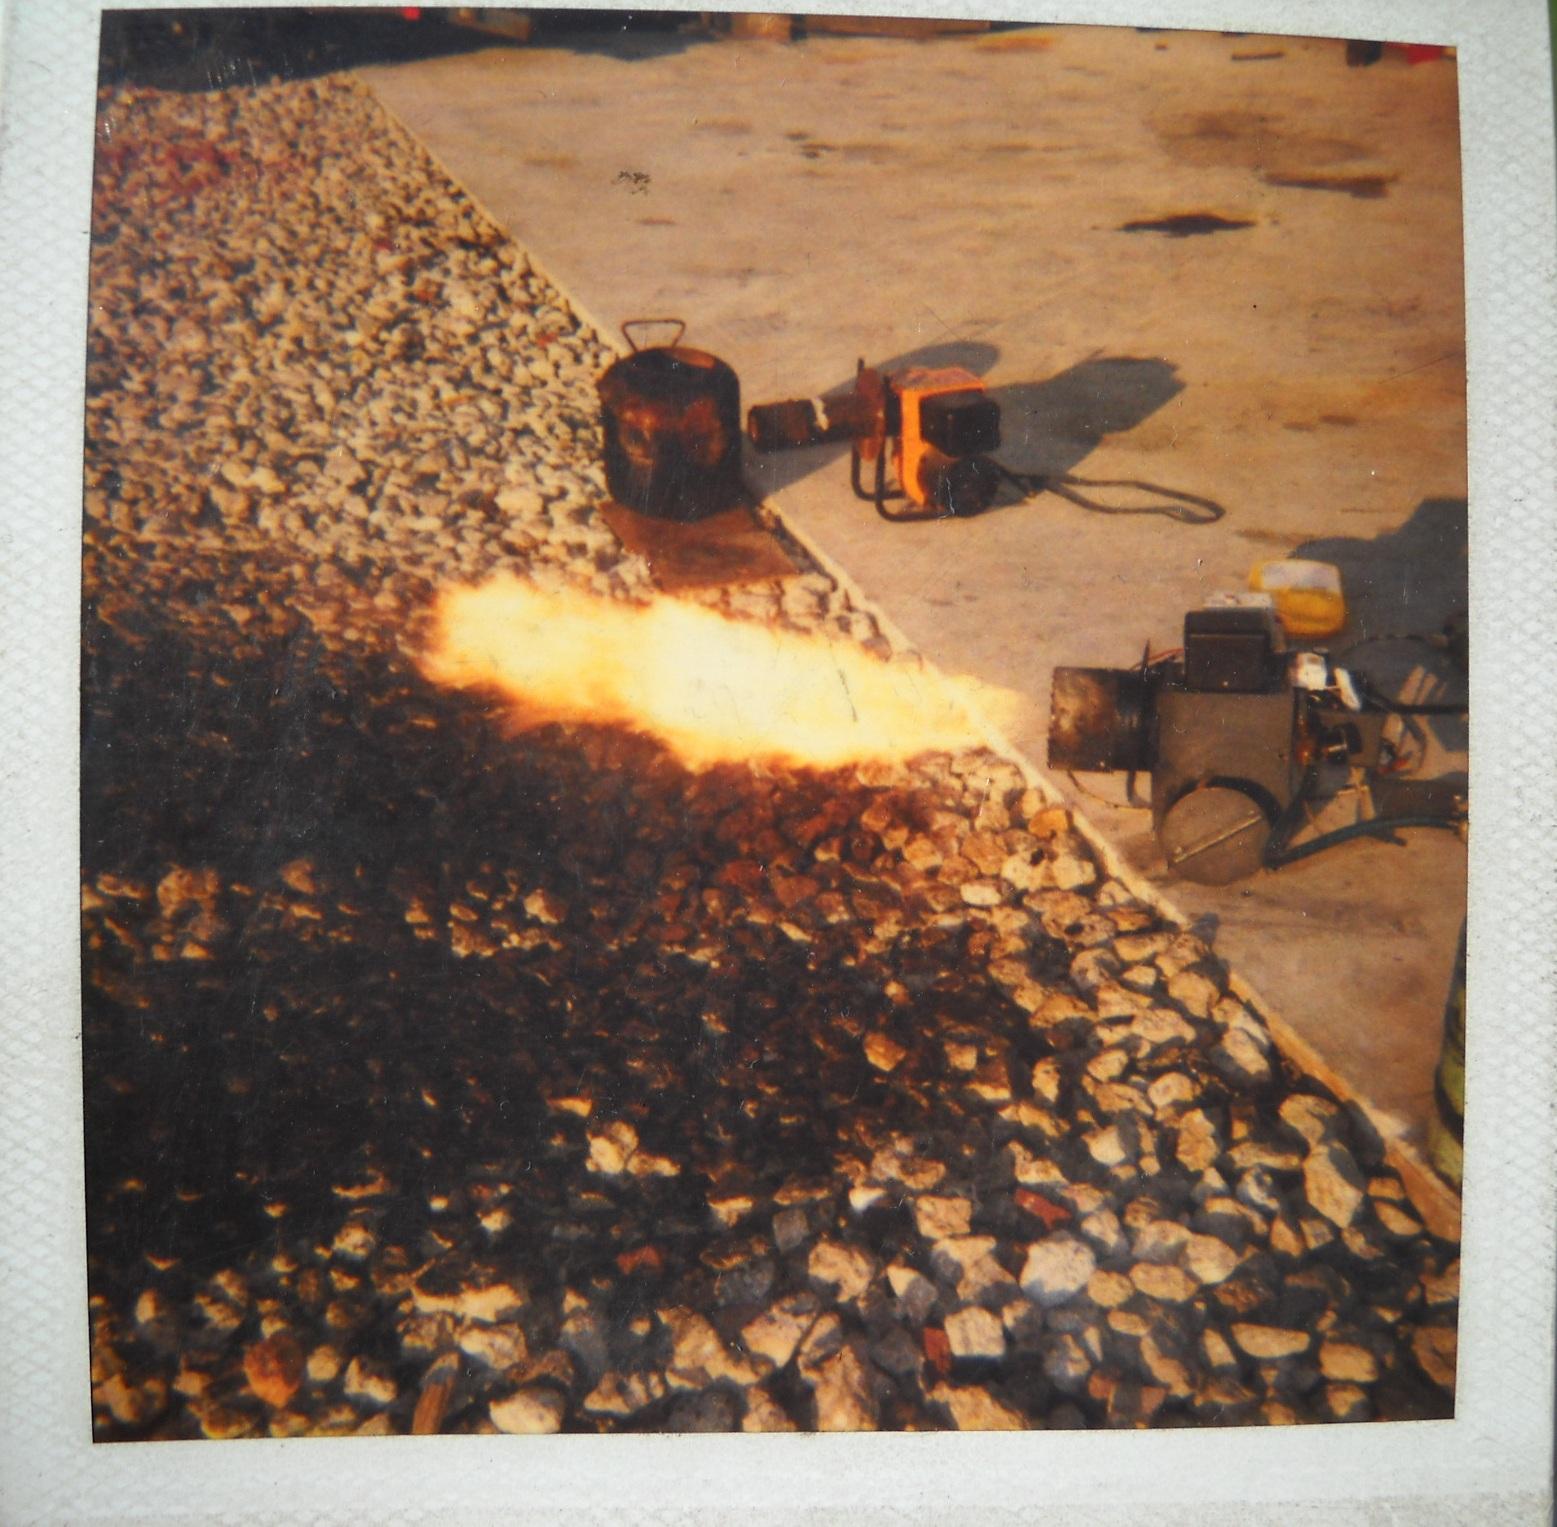 Shenandoah Page Waste Oil Heaters